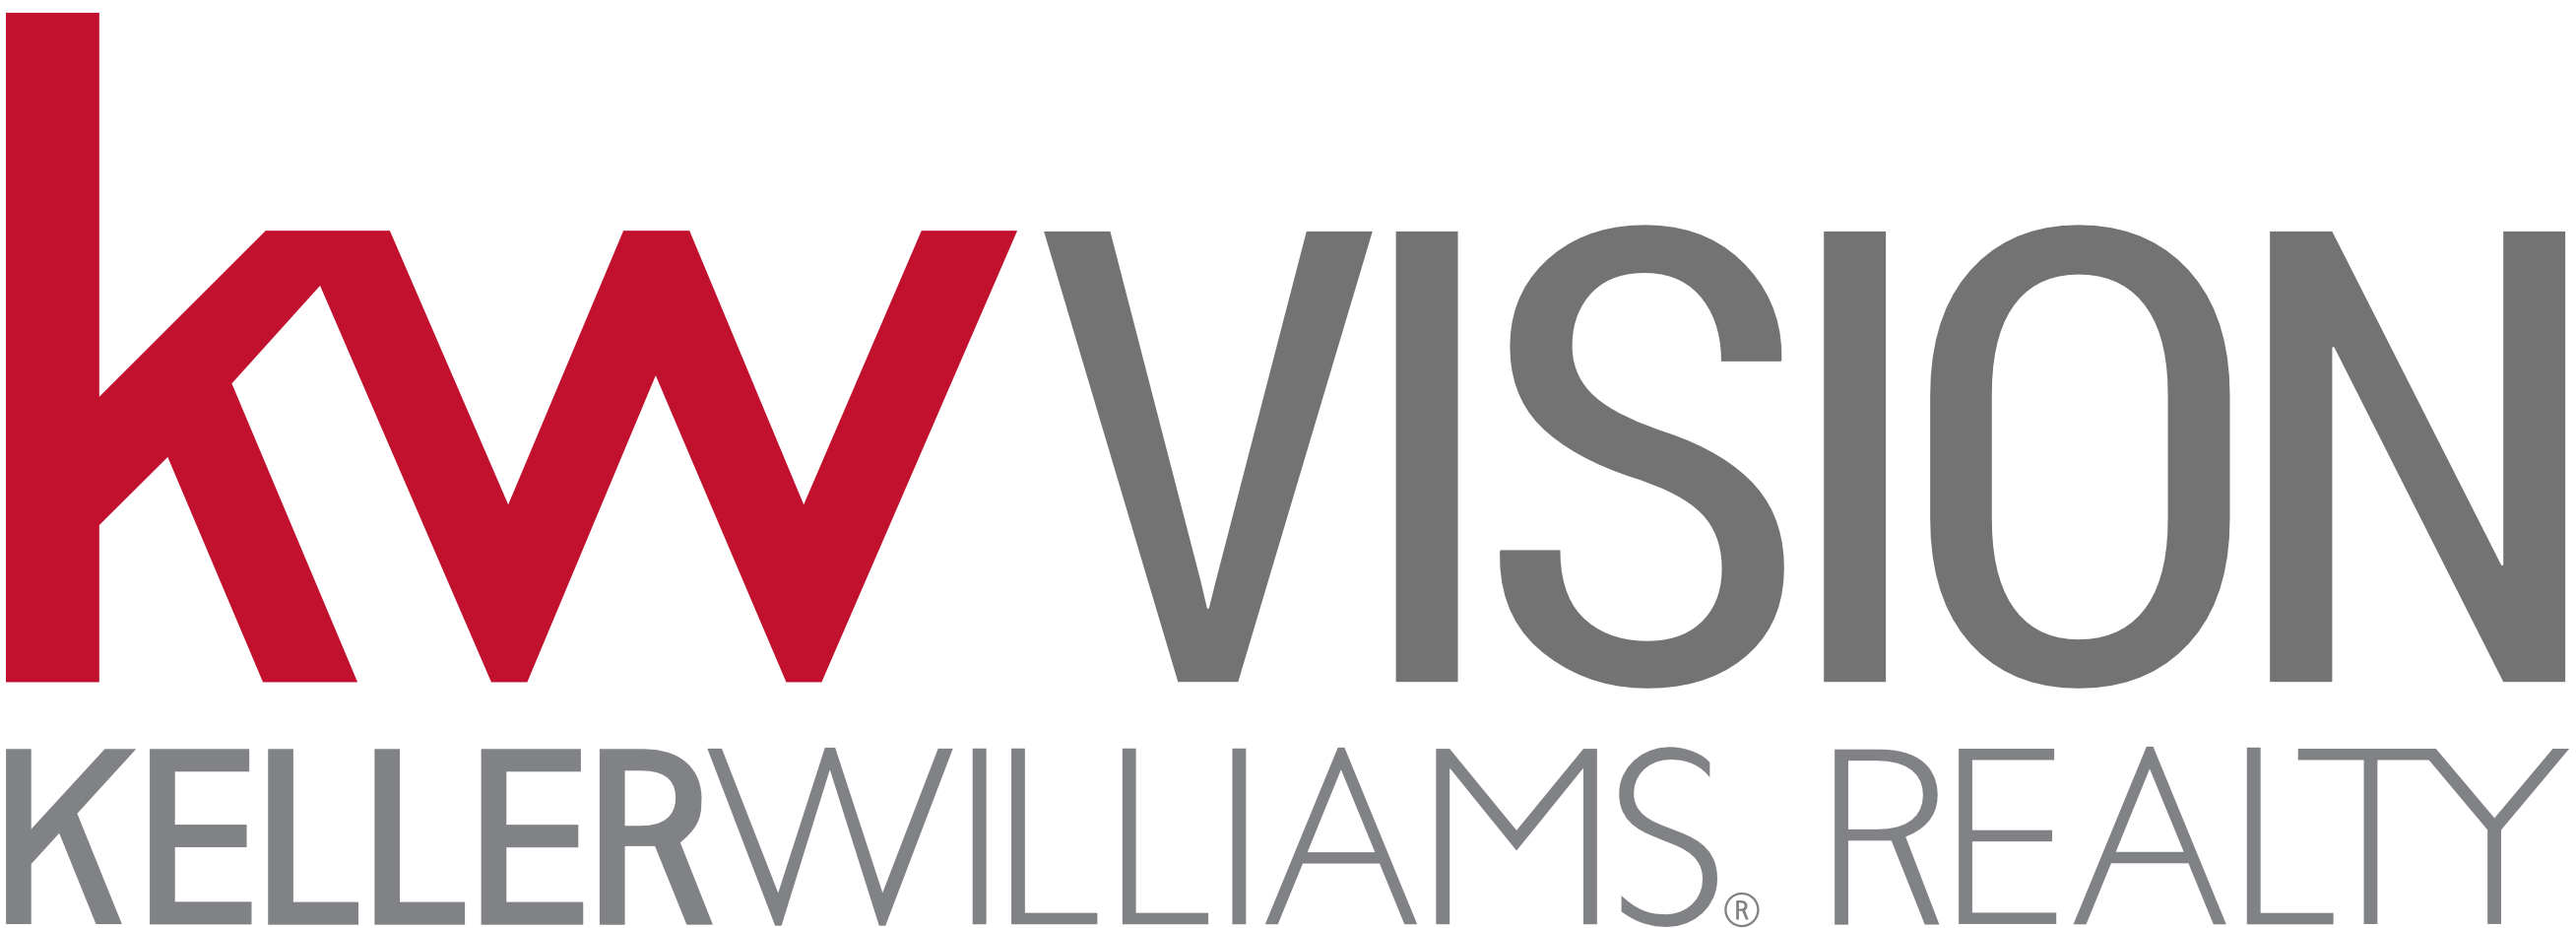 KW Vision - Chino Hills logo